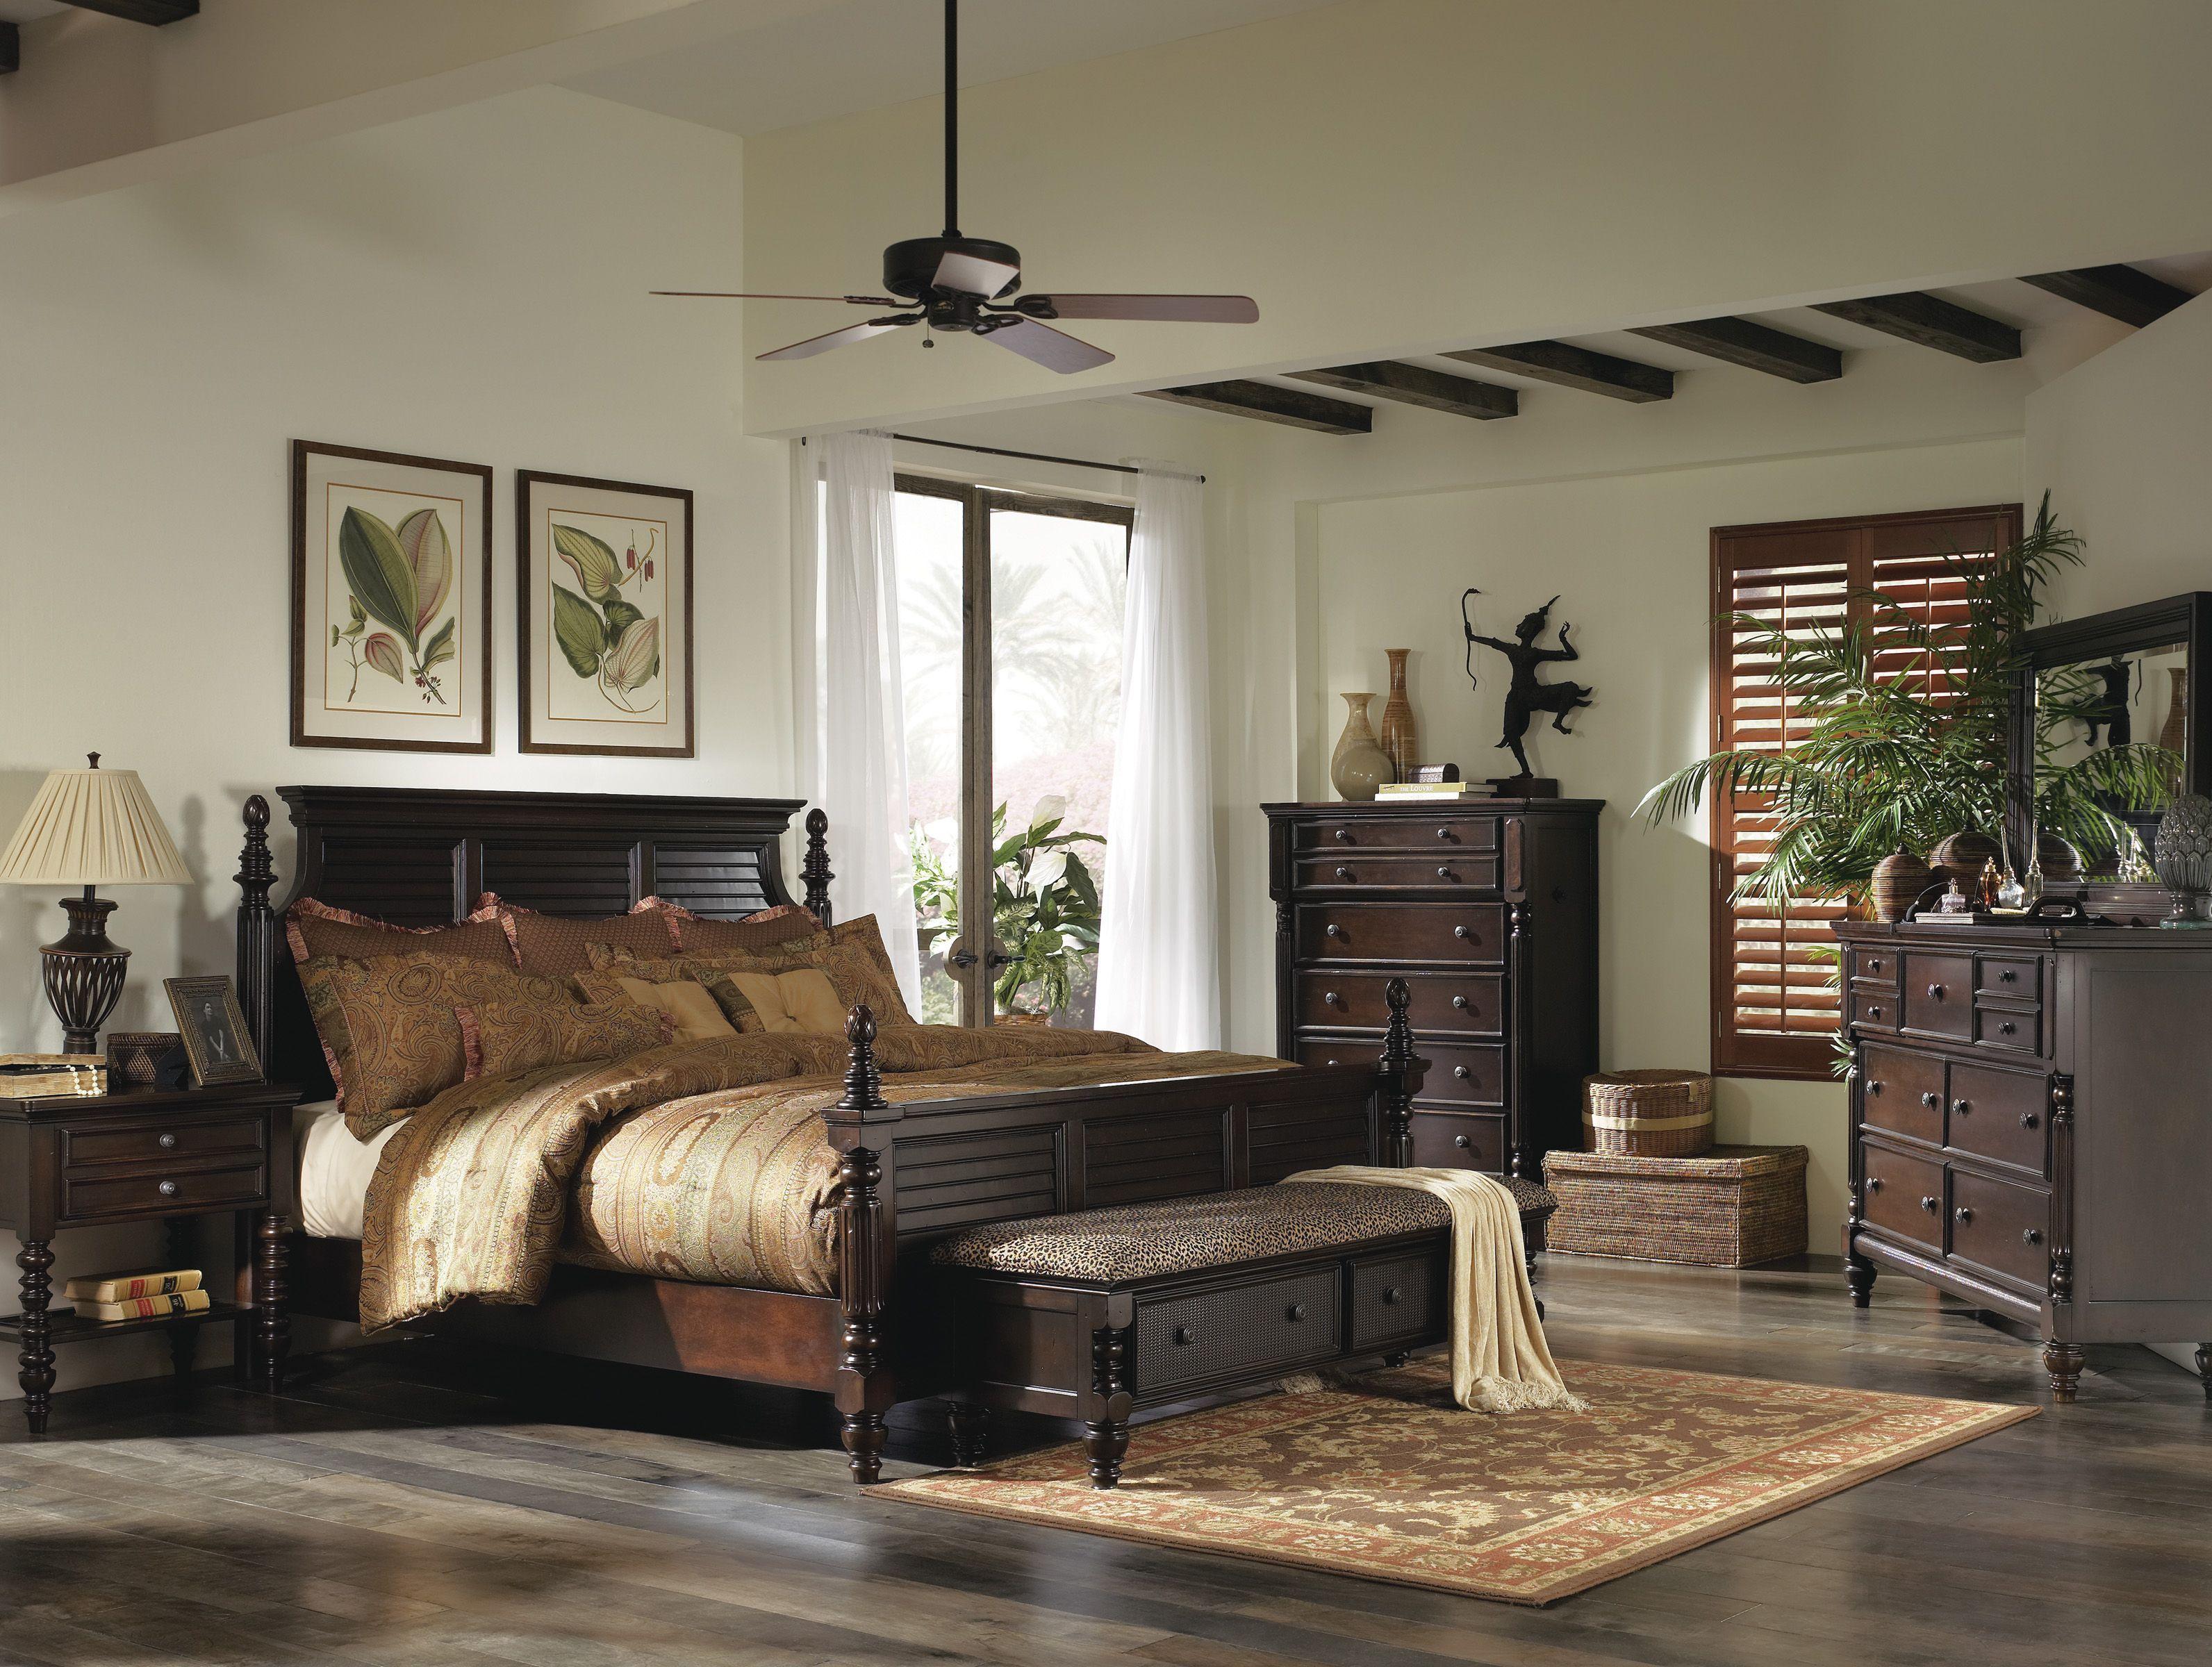 British Colonial Bedroom Furniture Bedrooms Pinterest